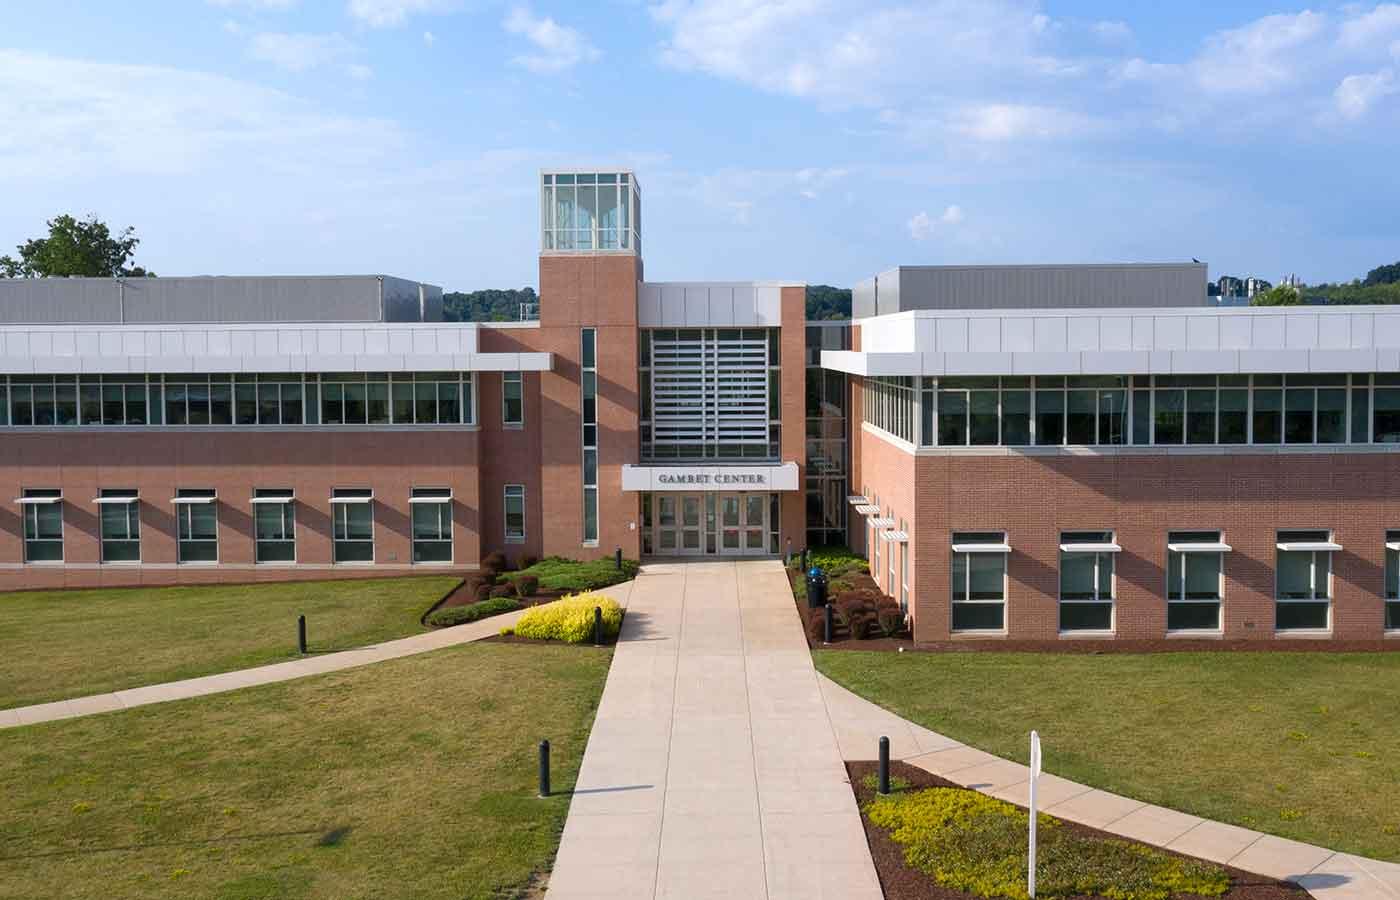 Gambet Center at DeSales University